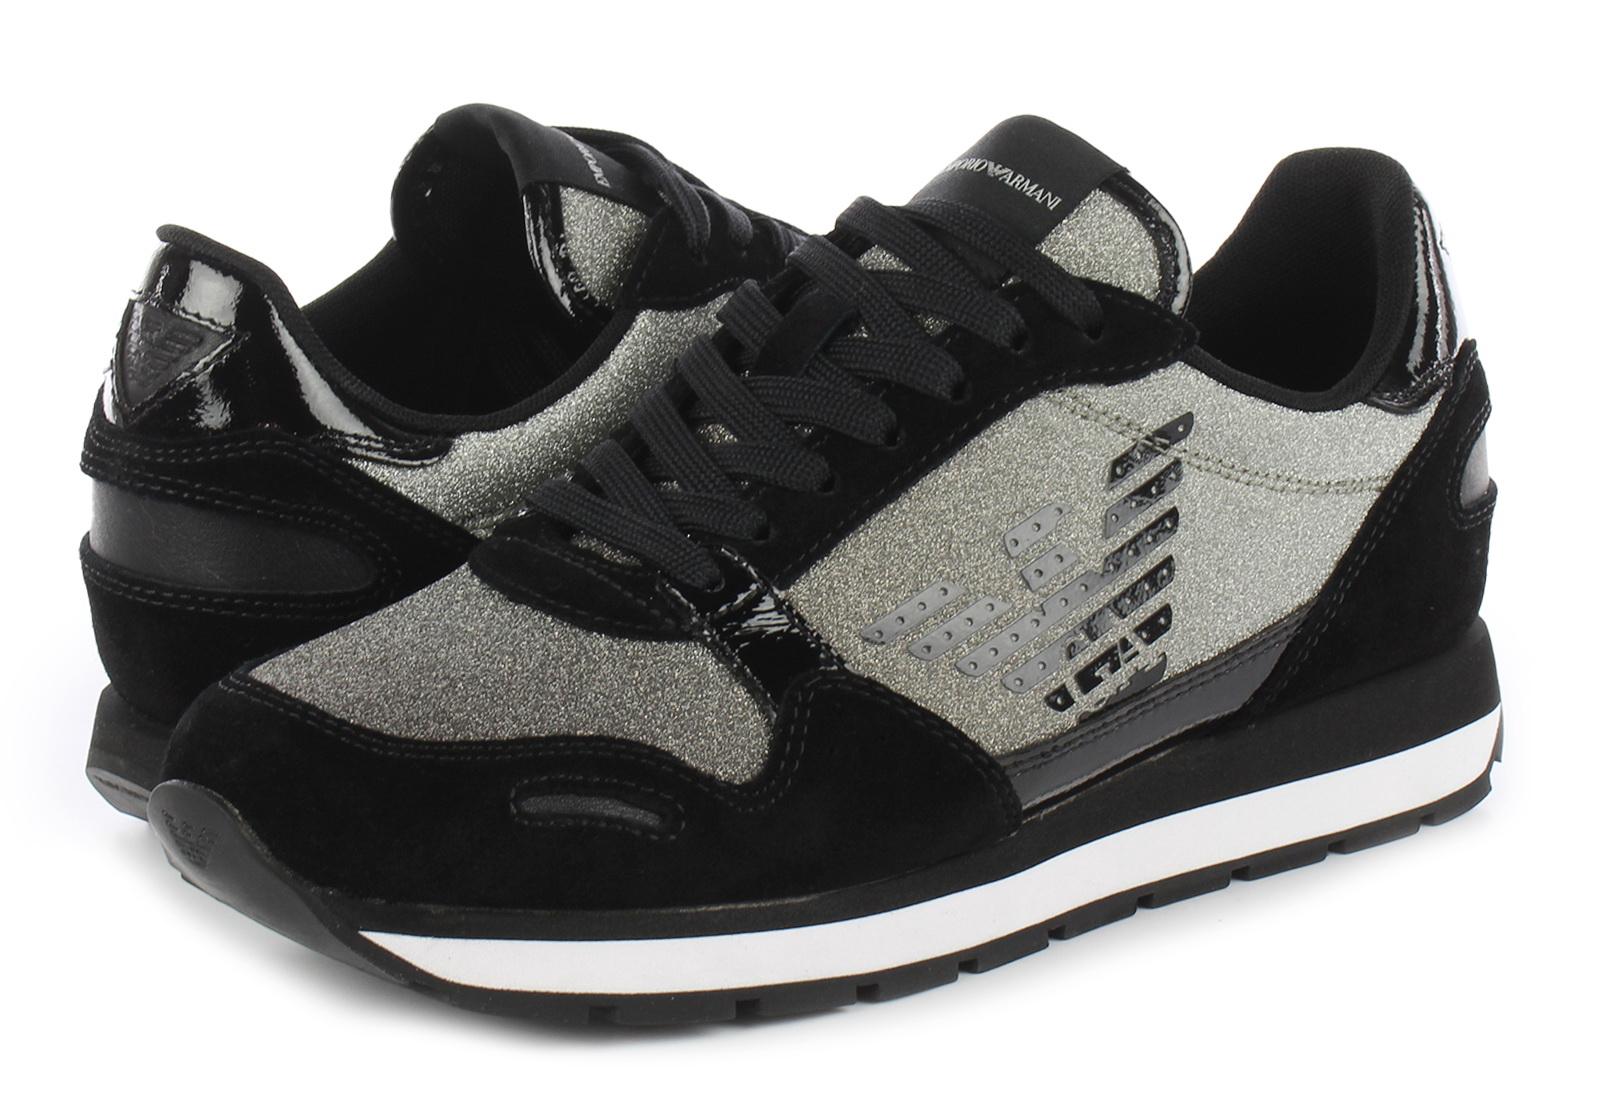 Emporio Armani Nízké Boty X3x058 Sneaker